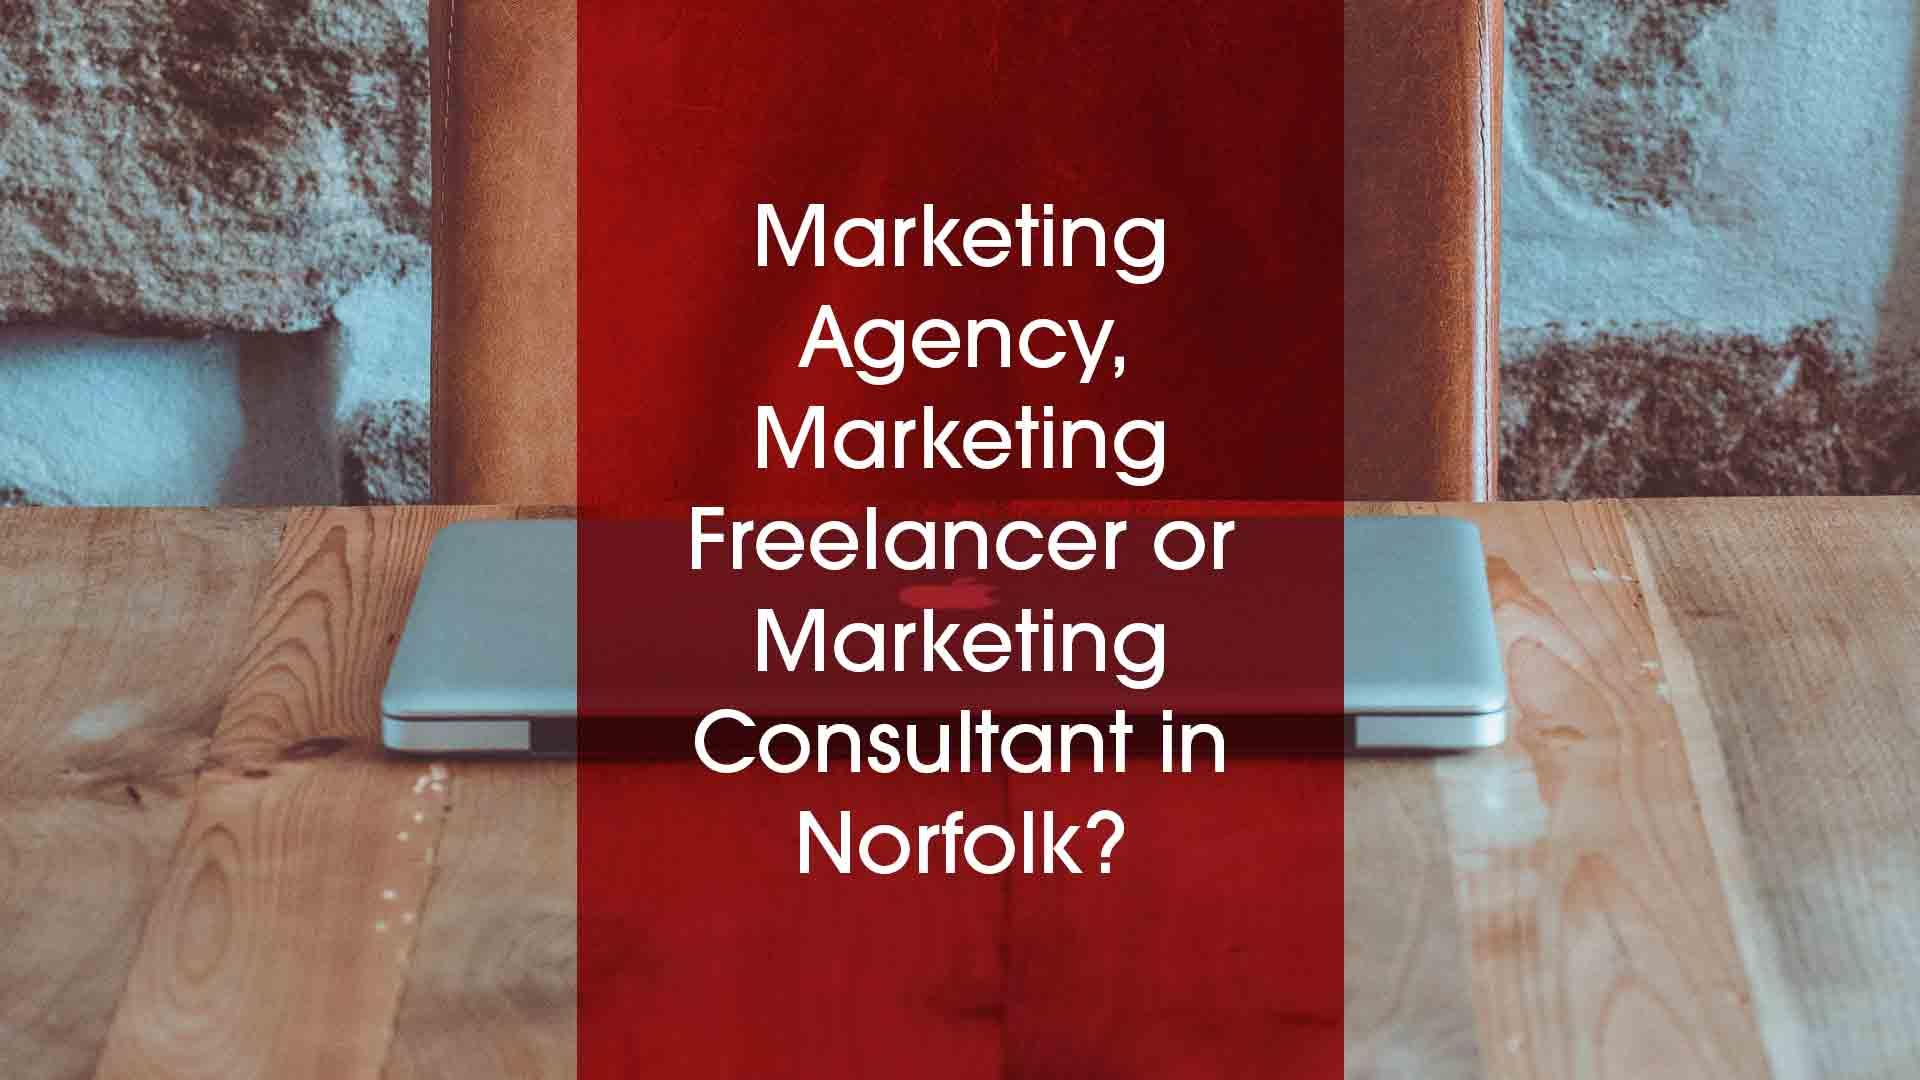 Marketing agency, marketing freelancer or marketing consultant in Norfolk